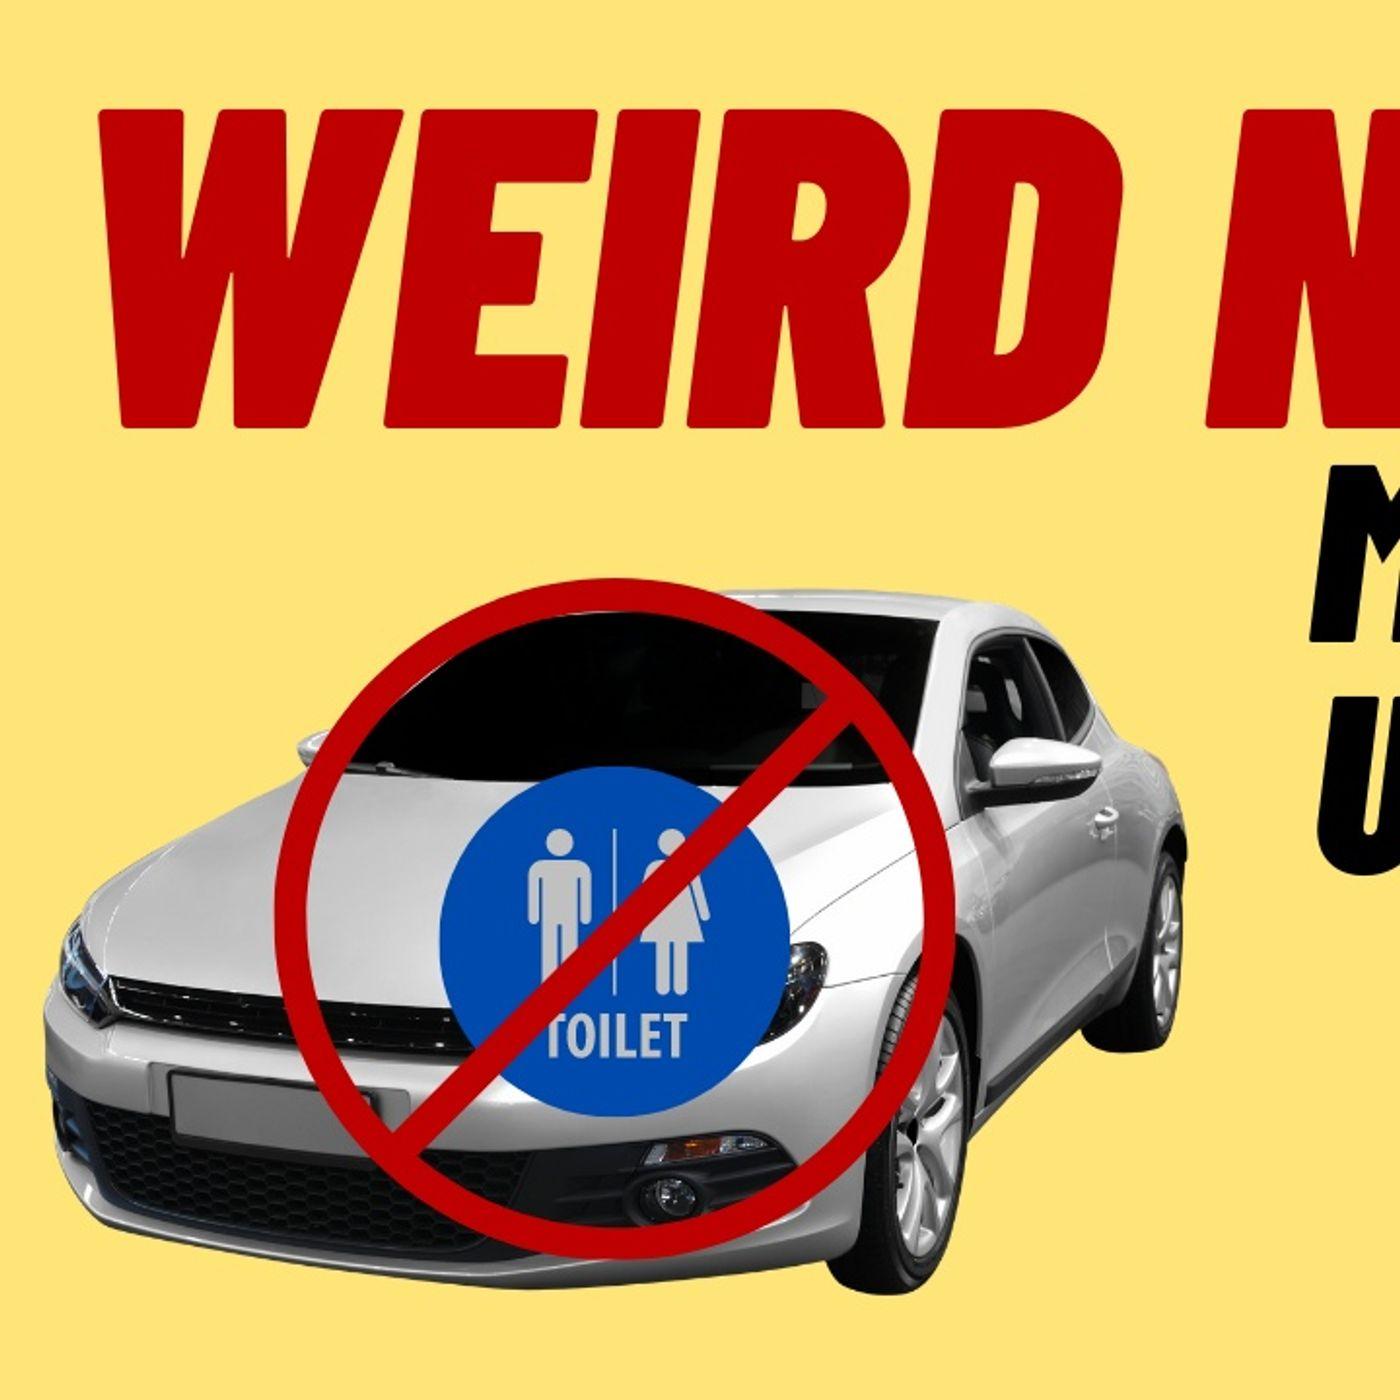 WEIRD NEWS - MAN USES UNLOCKED CARS AS TOILET